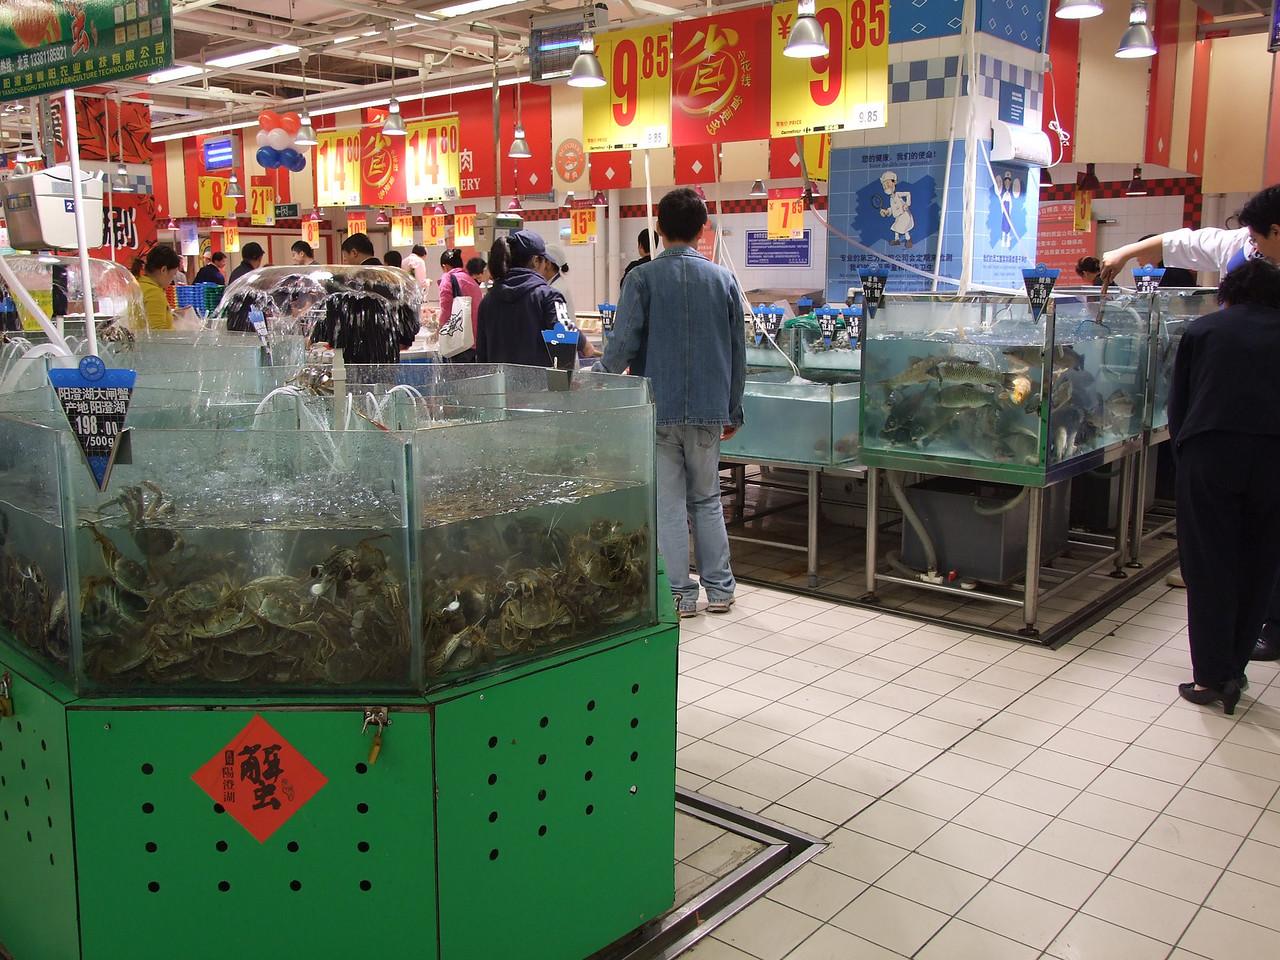 chez Carrefour - les crabes (i granchi)